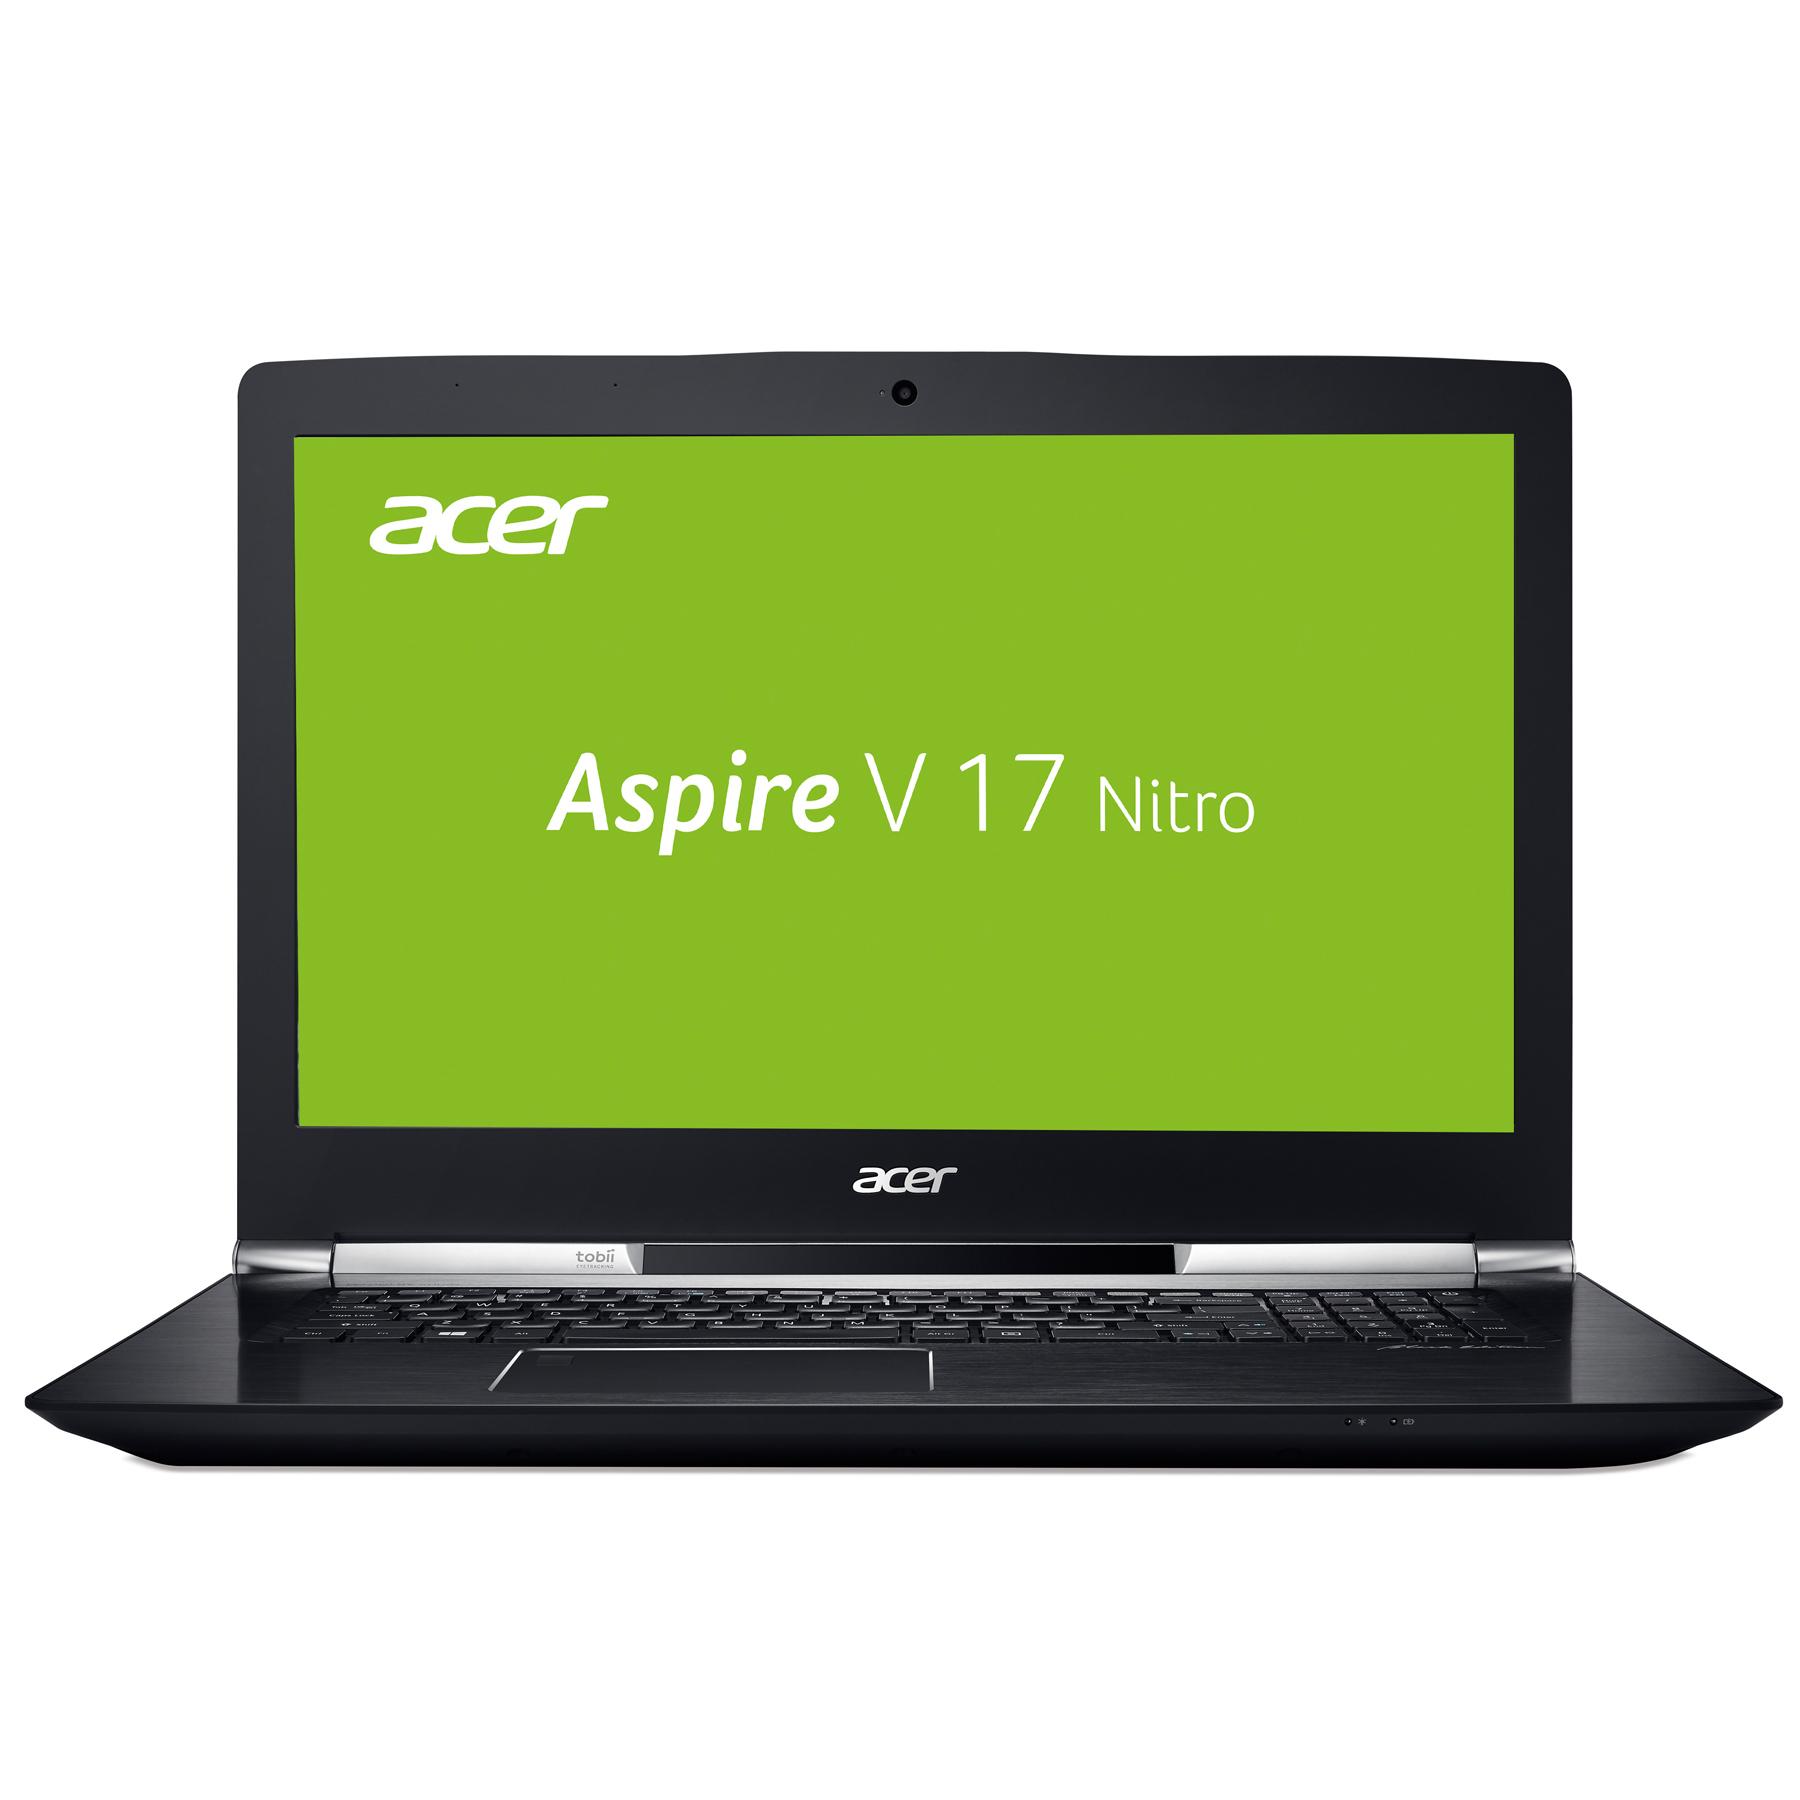 "[NBB] Acer Aspire V 17 Nitro Gaming (VN7-793G-71AG) 17,3"" Full HD IPS Intel Core i7-7700HQ 8GB DDR4 GeForce GTX 1060 ohne Windows"